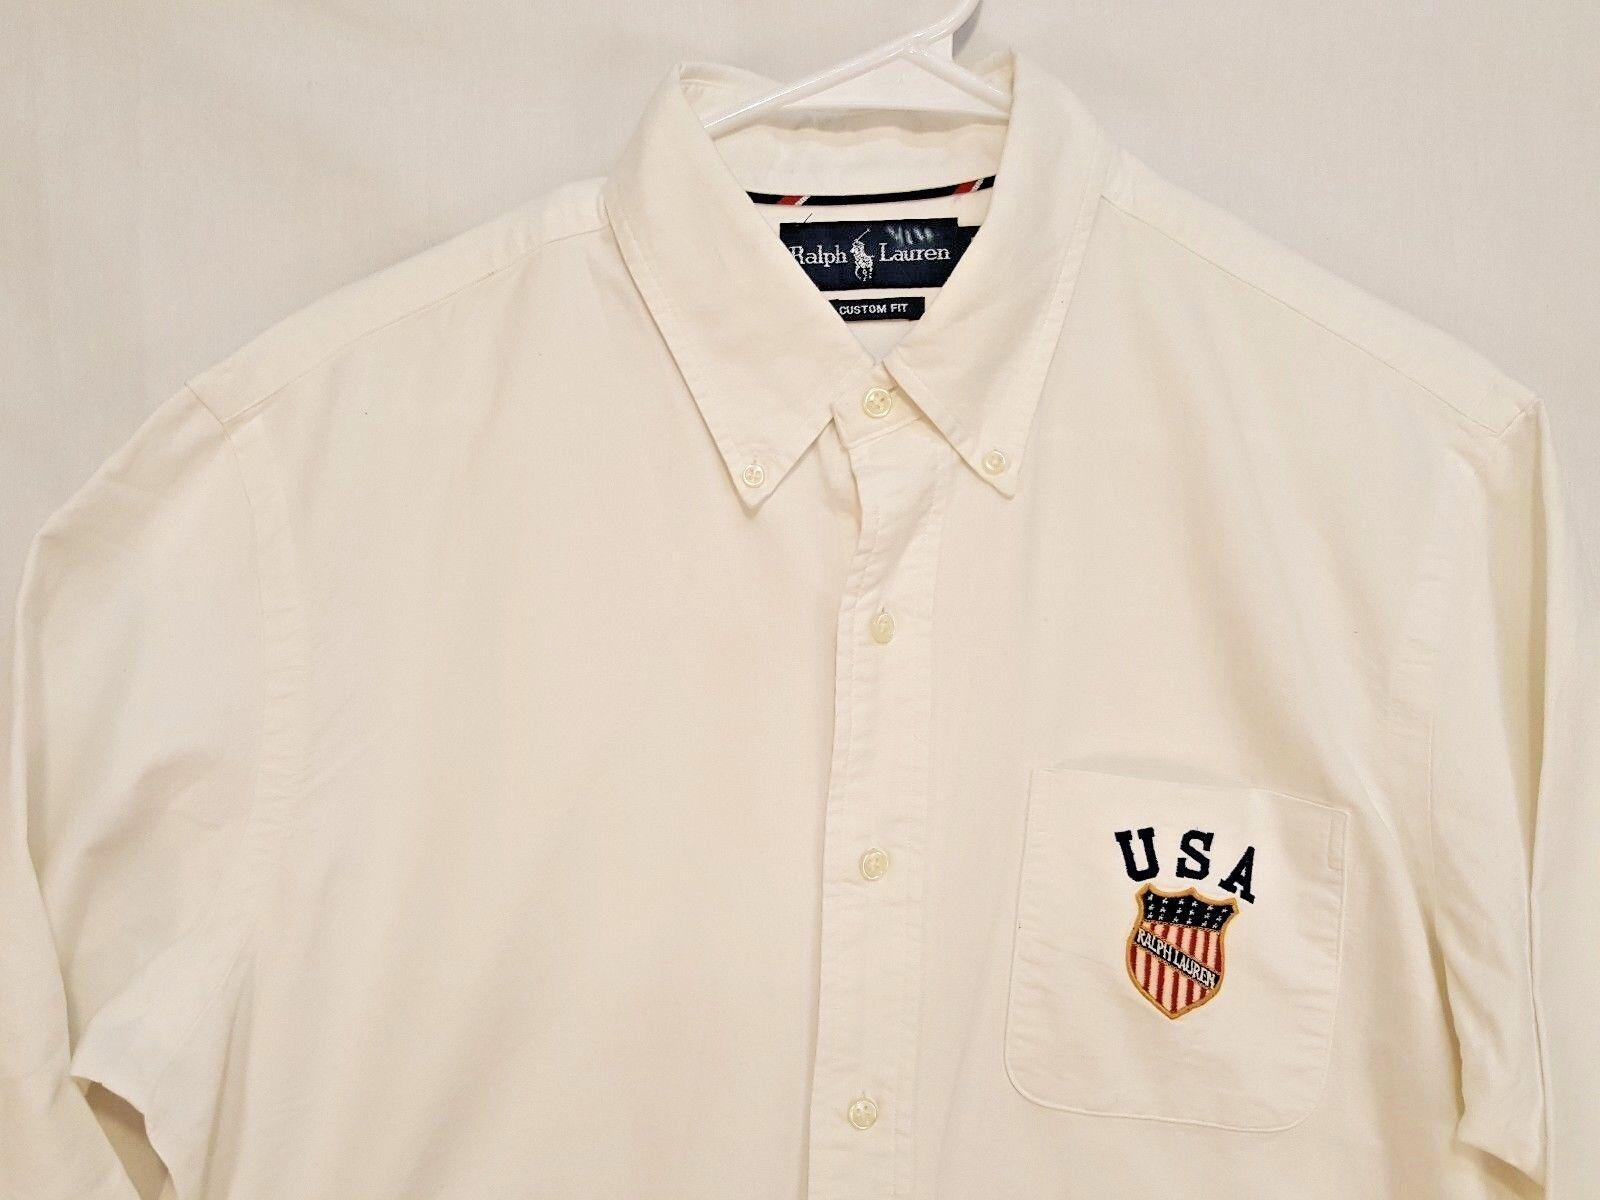 d212a506decf16 Polo Ralph USA Embroidered USA Crest Shield Olympic Shirt Sz L Lauren Vtg  obozjj11063-Casual Shirts   Tops